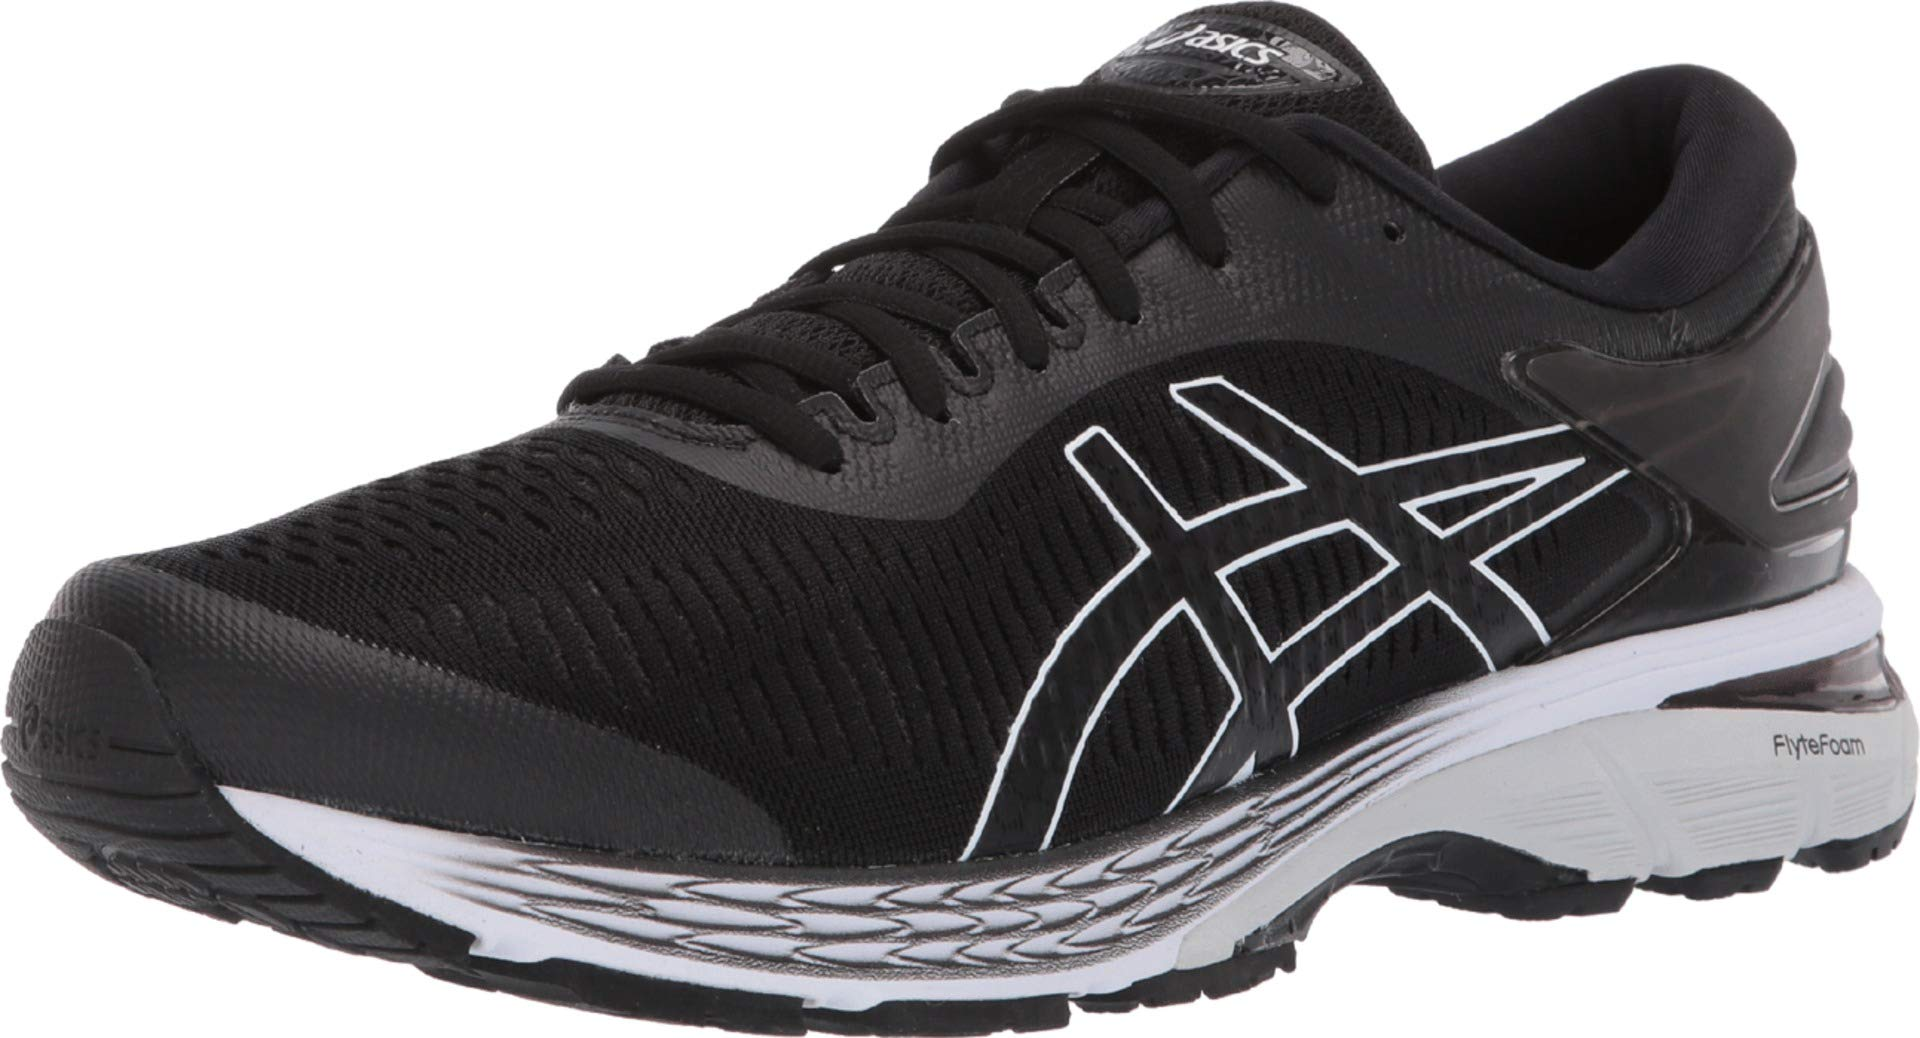 ASICS Gel Kayano 25 Men's Running Shoe, Black/Glacier Grey, 6.5 D US by ASICS (Image #1)